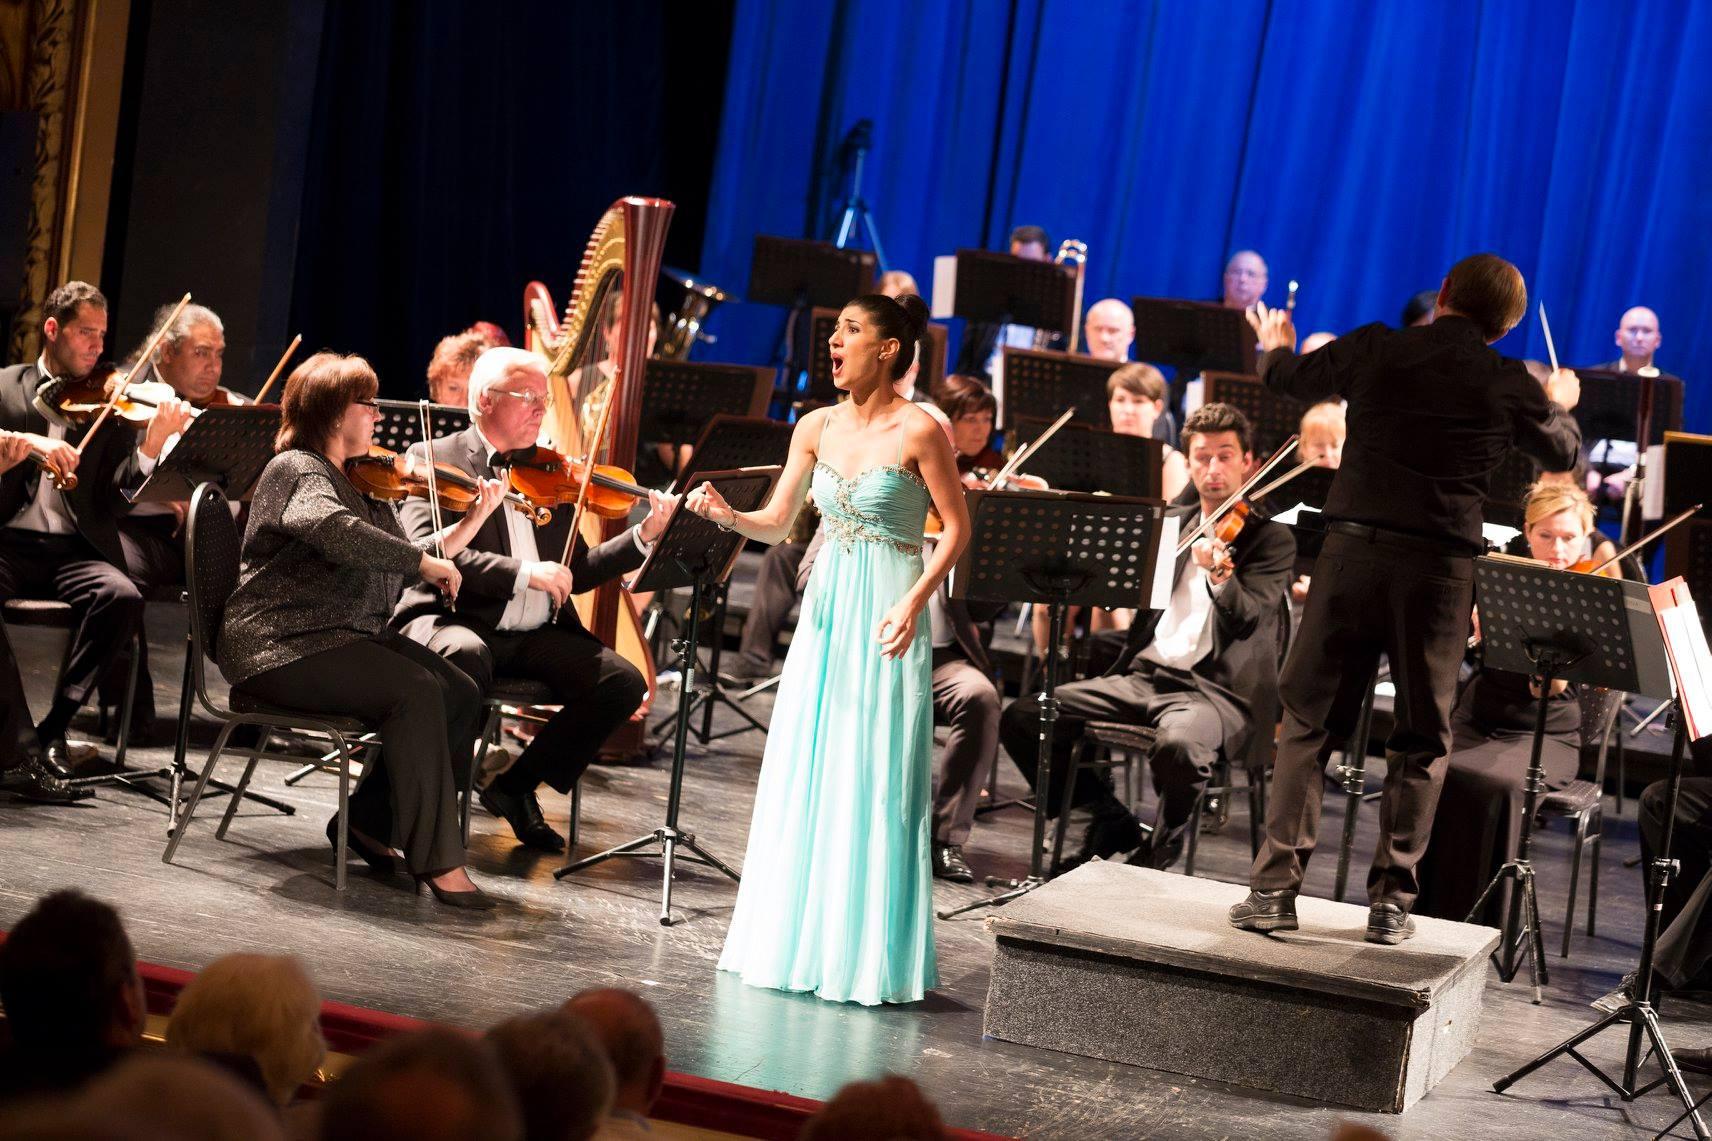 Opernfest Prague